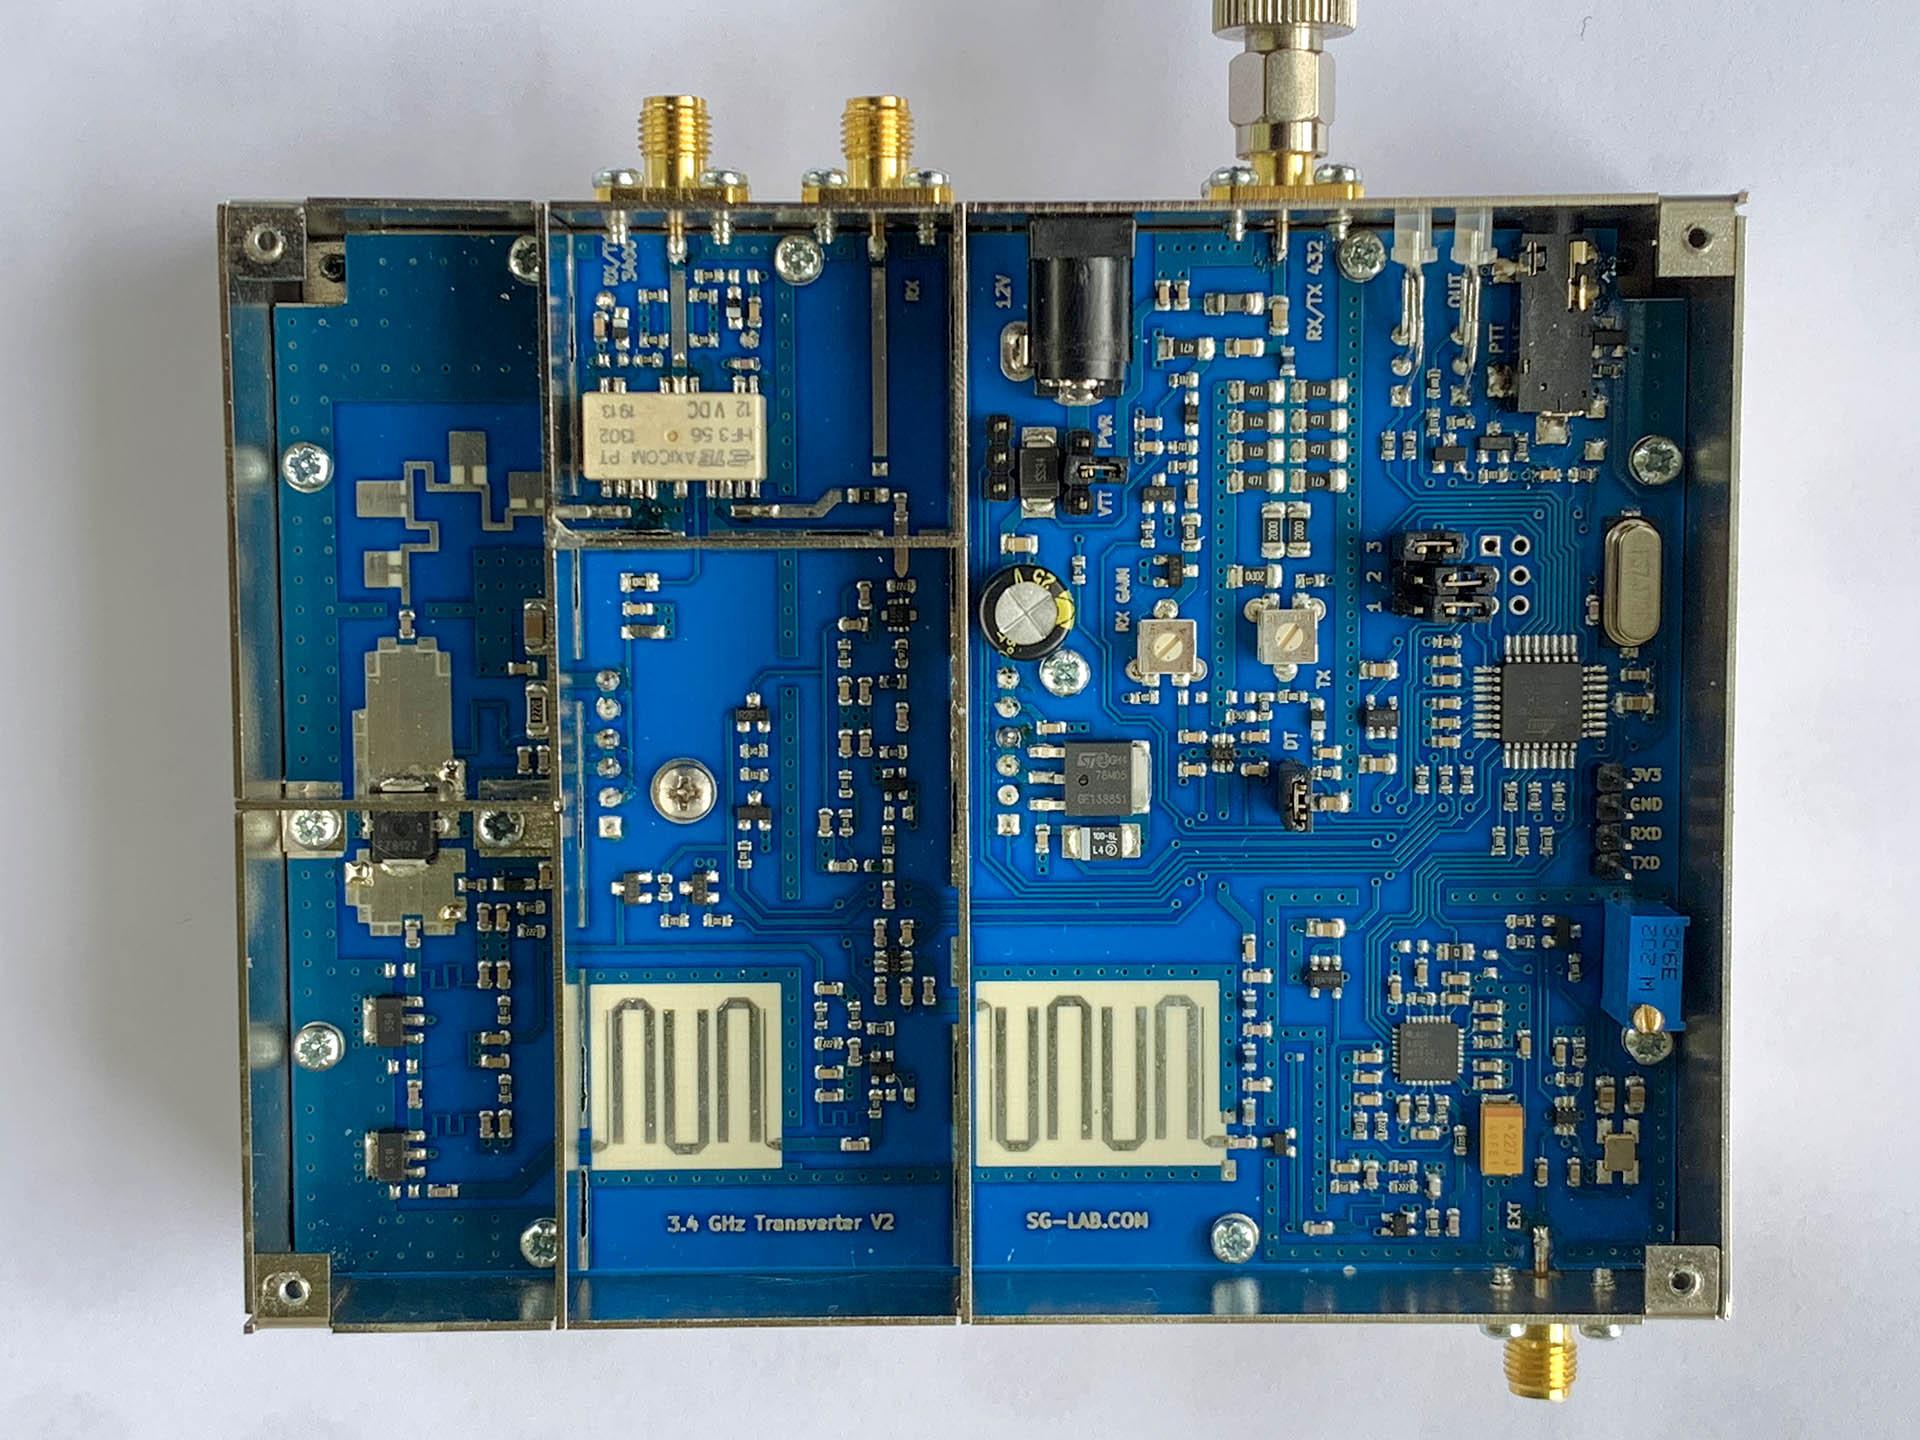 SG Lab 3400 MHz Transverter V2 top